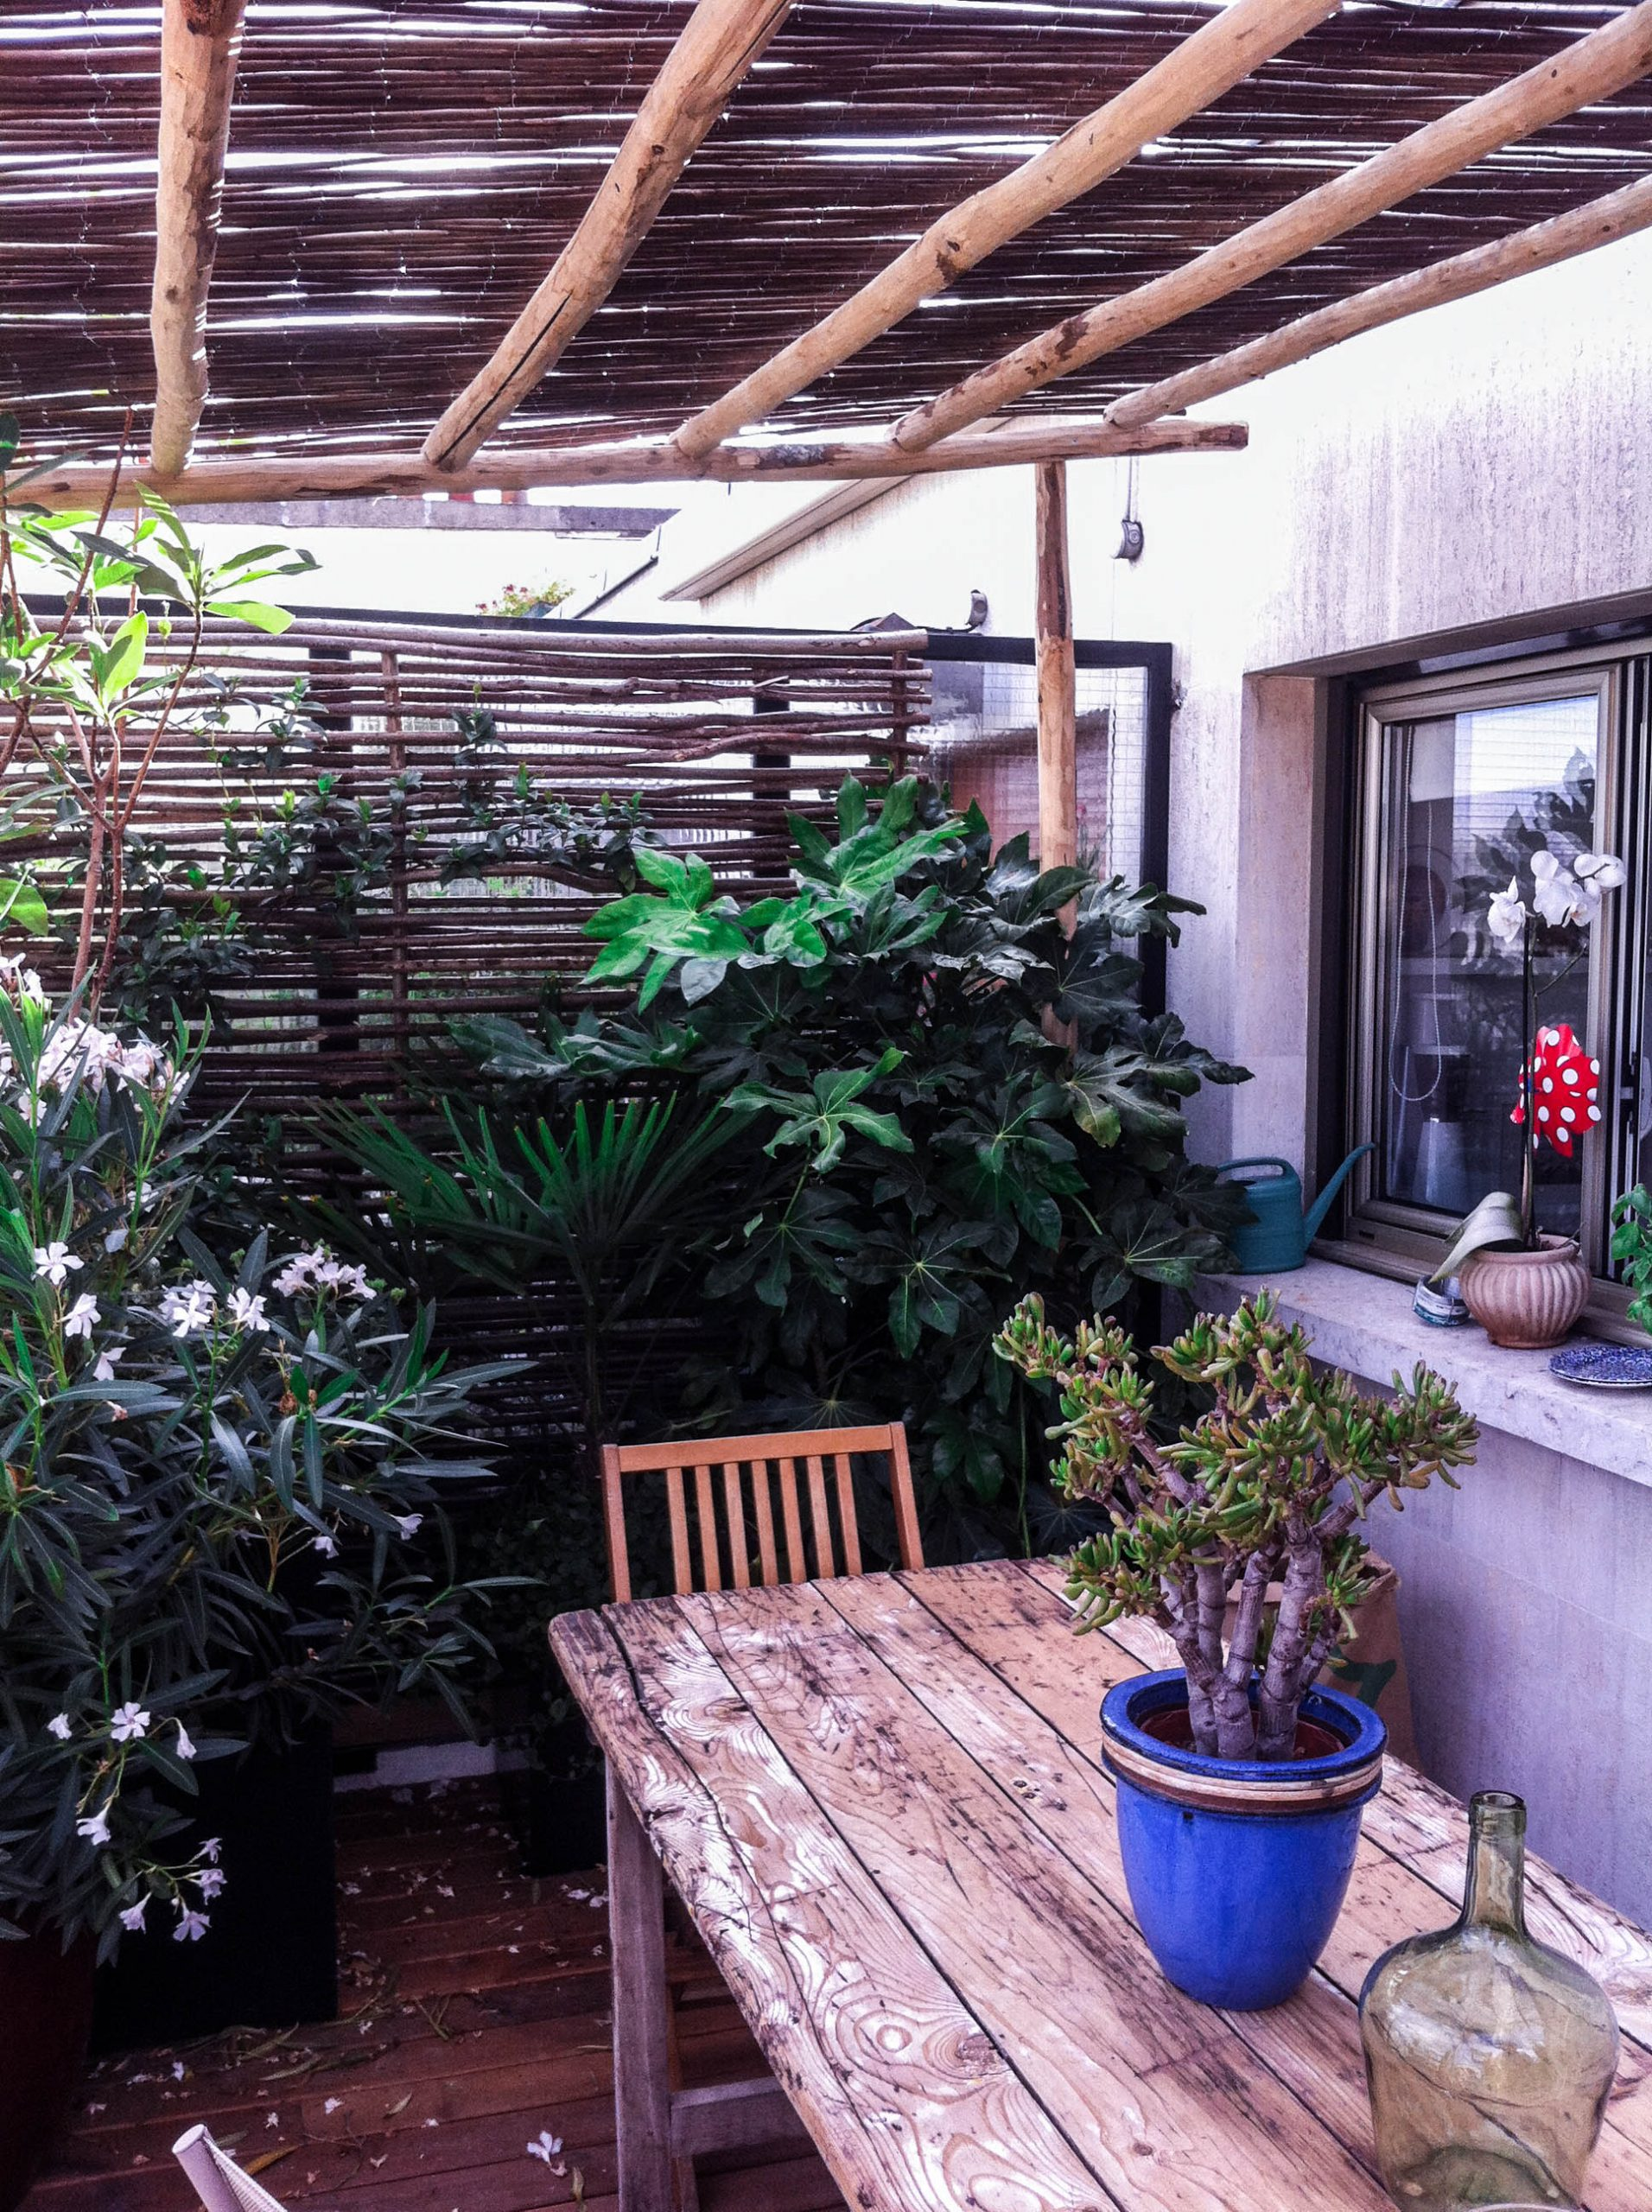 Portfolio De Swandy Wenker | 1G Solutions avec Paillote Jardin